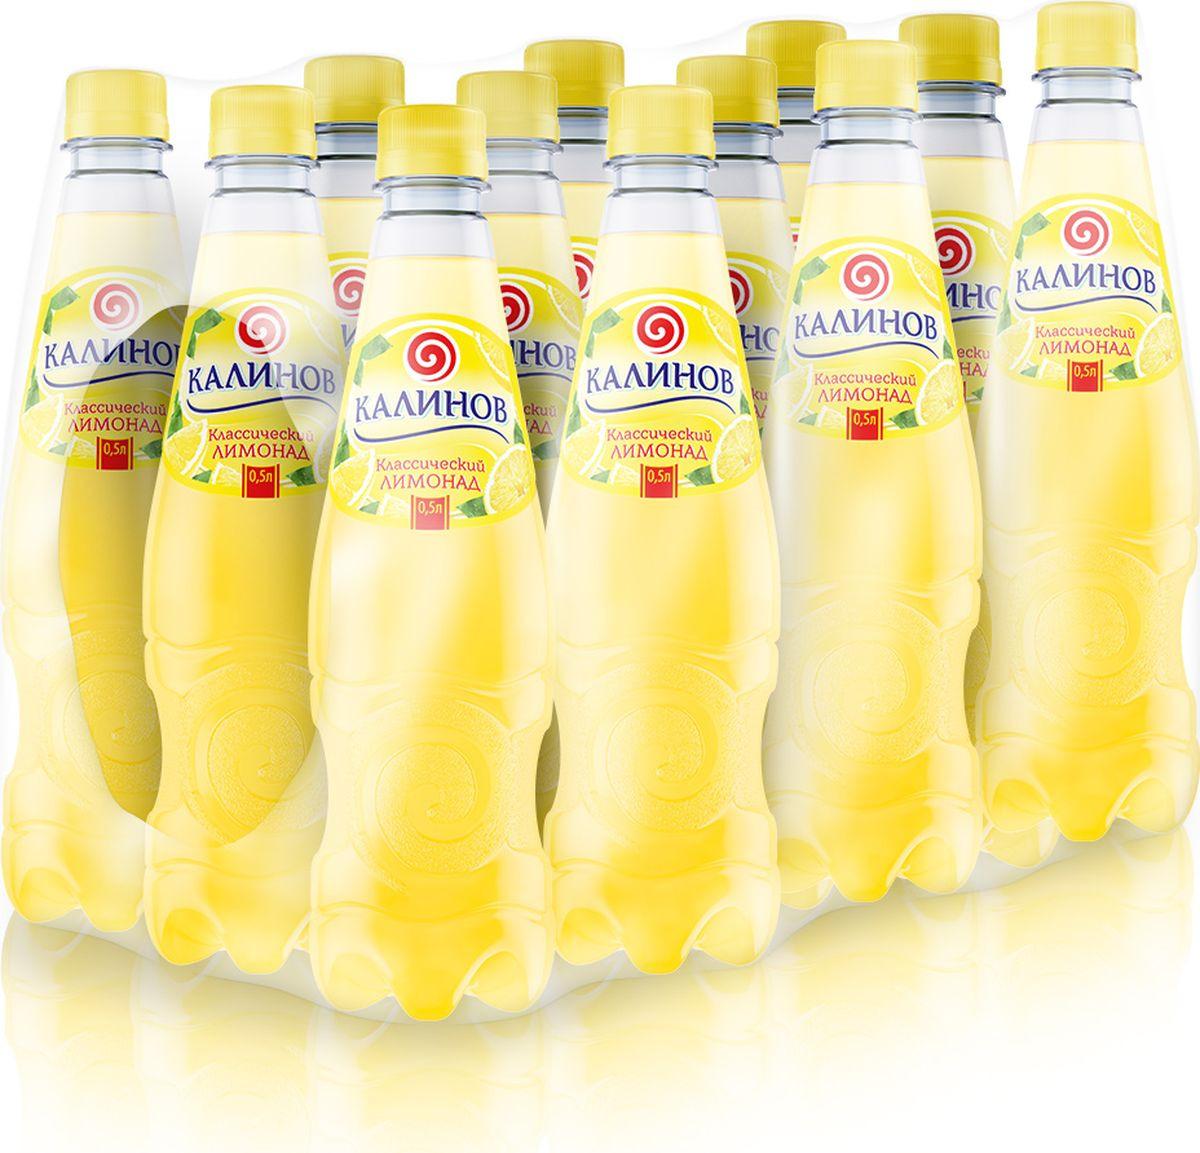 Калинов Лимонад классический, 12 шт по 0,5 л калинов лимонад кола 12 шт по 0 5 л